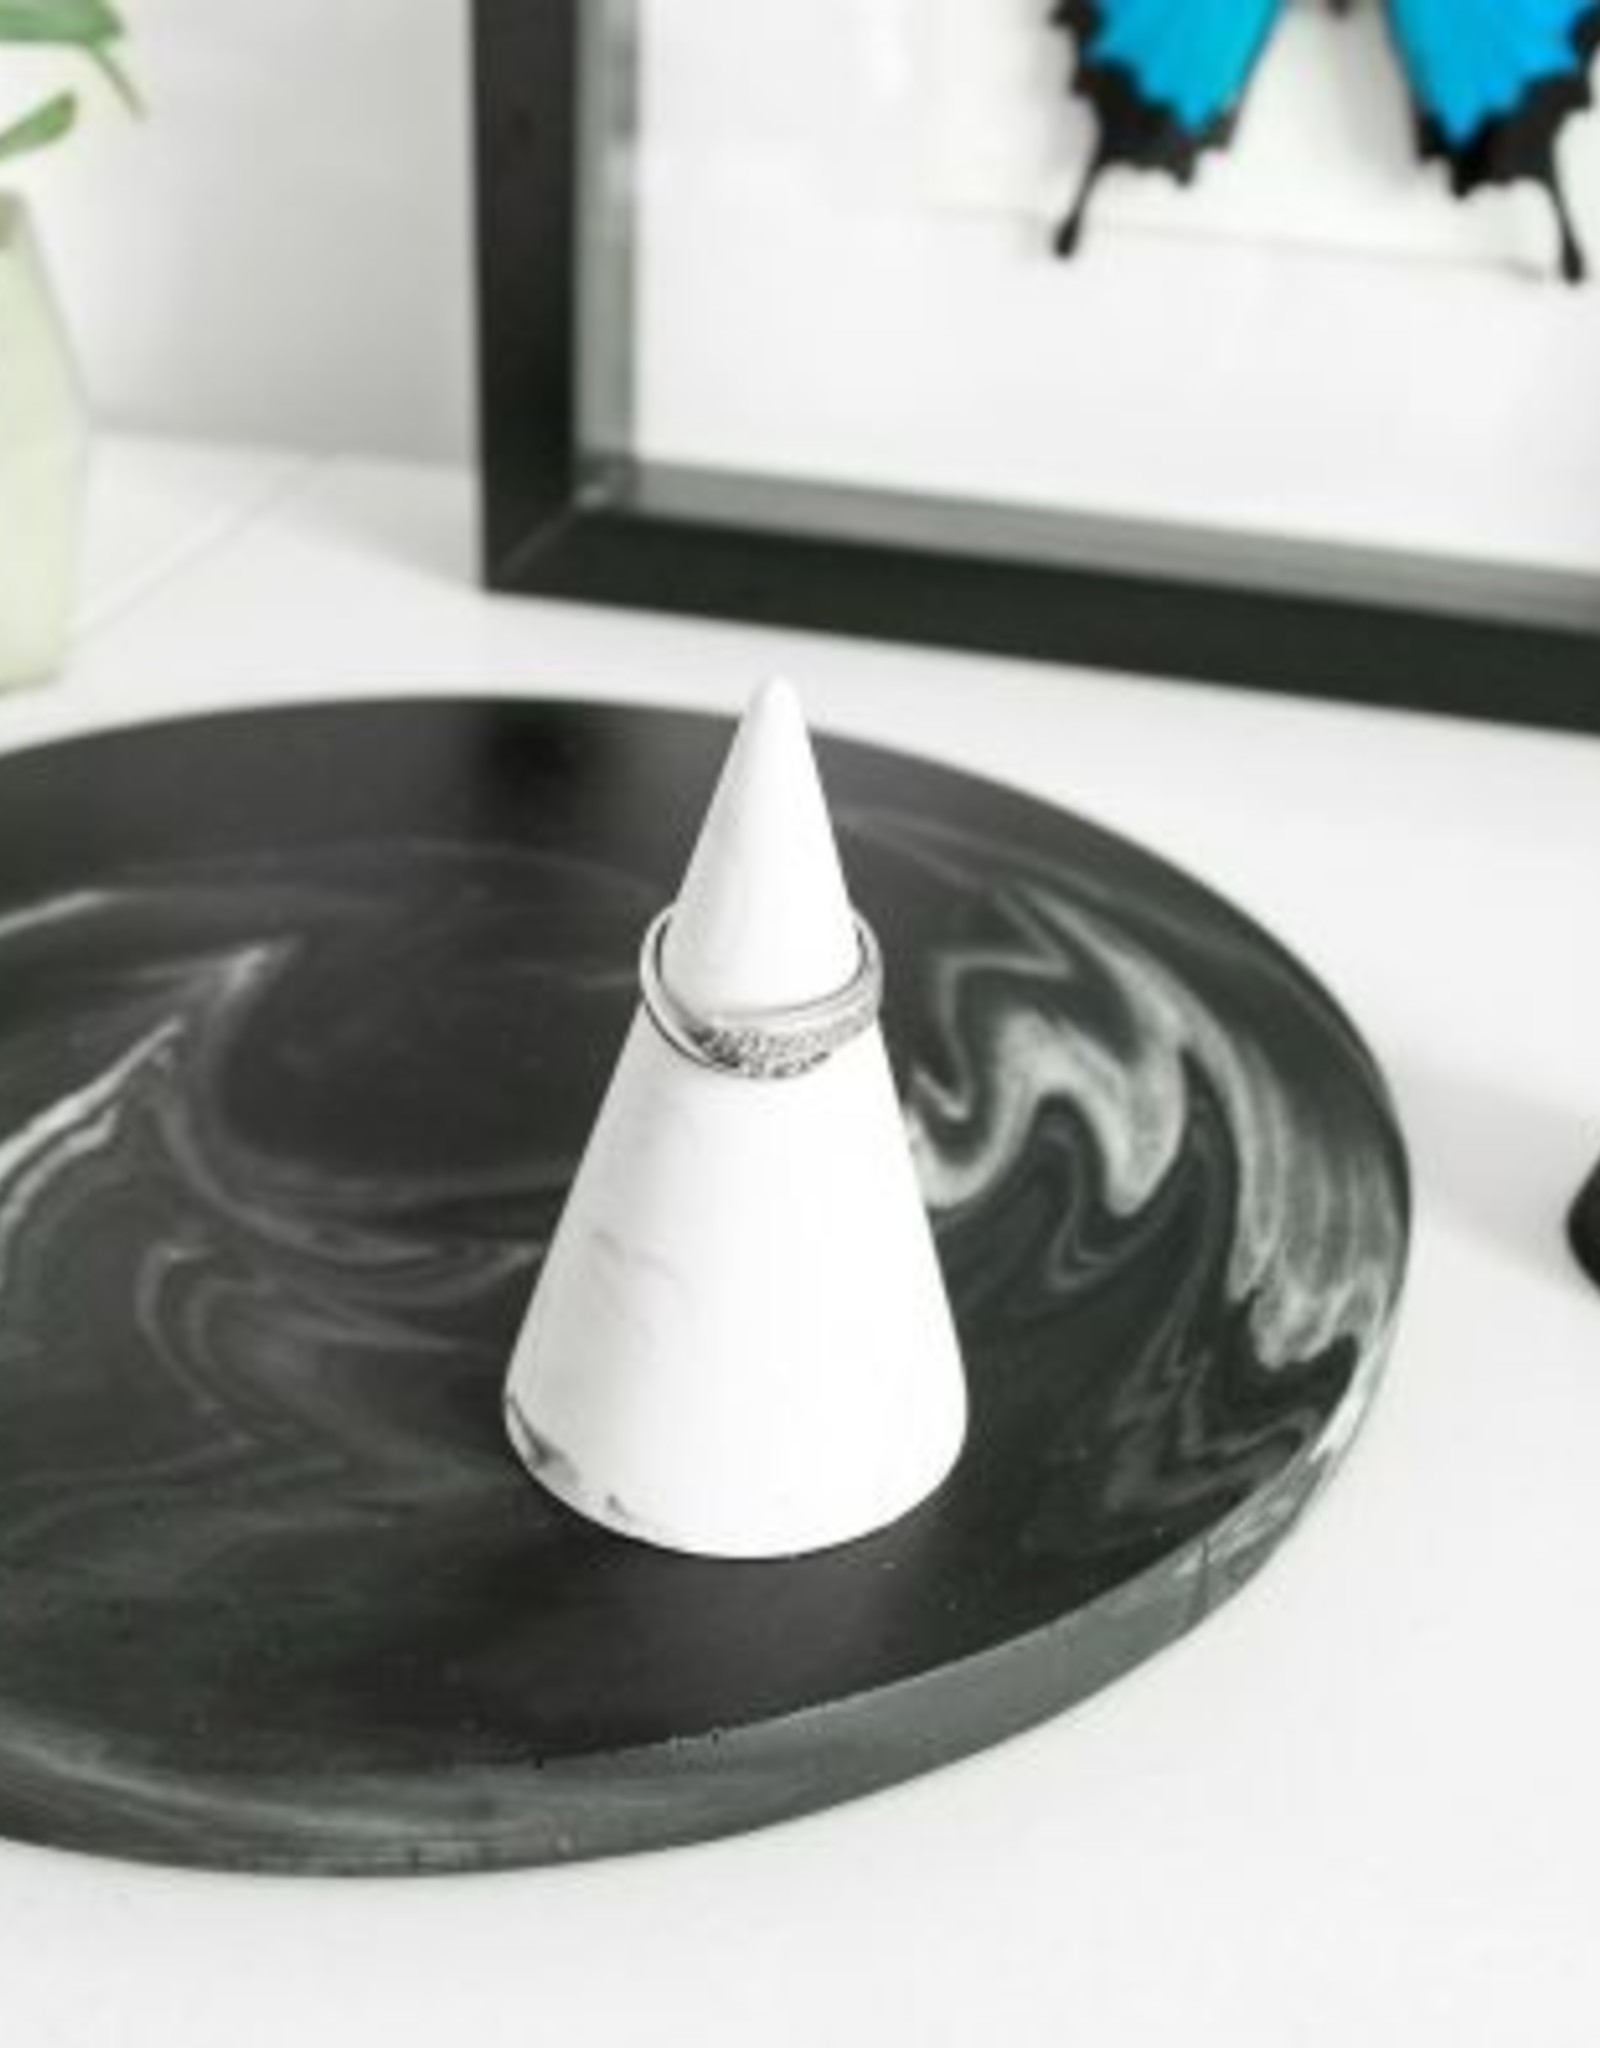 House Raccoon House Raccoon - Kiona Ring cone - Black marble